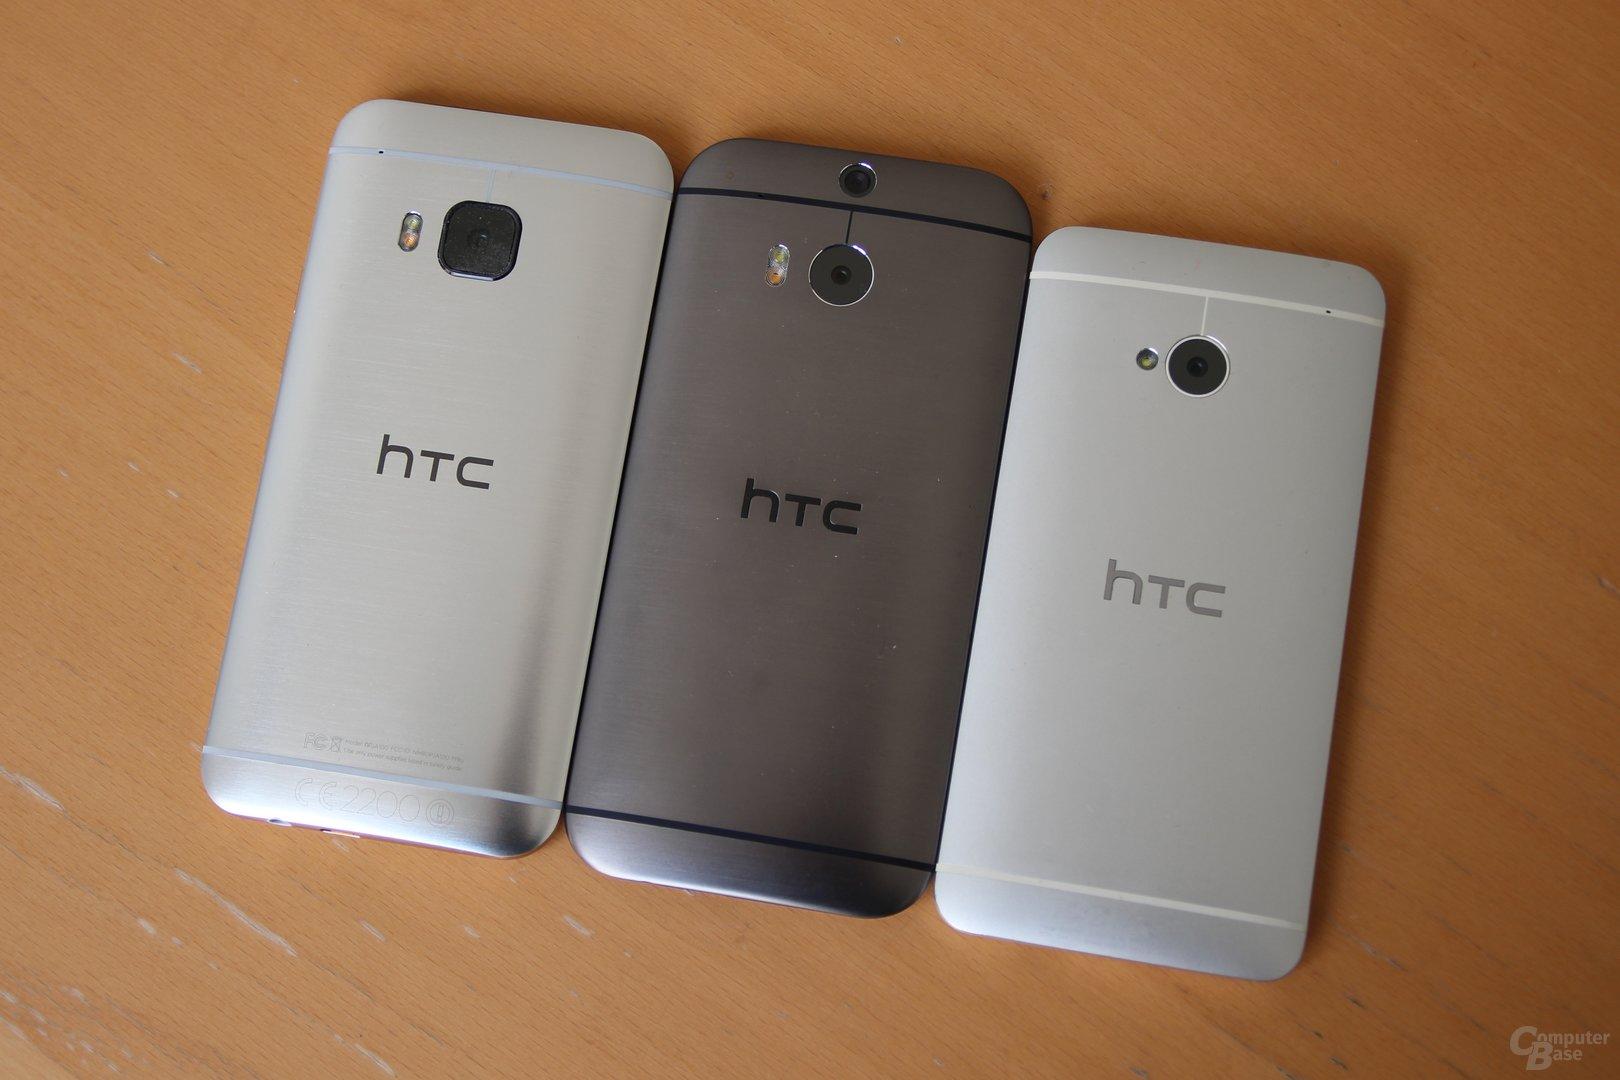 v.l.n.r.: HTC One M9, One (M8) und One